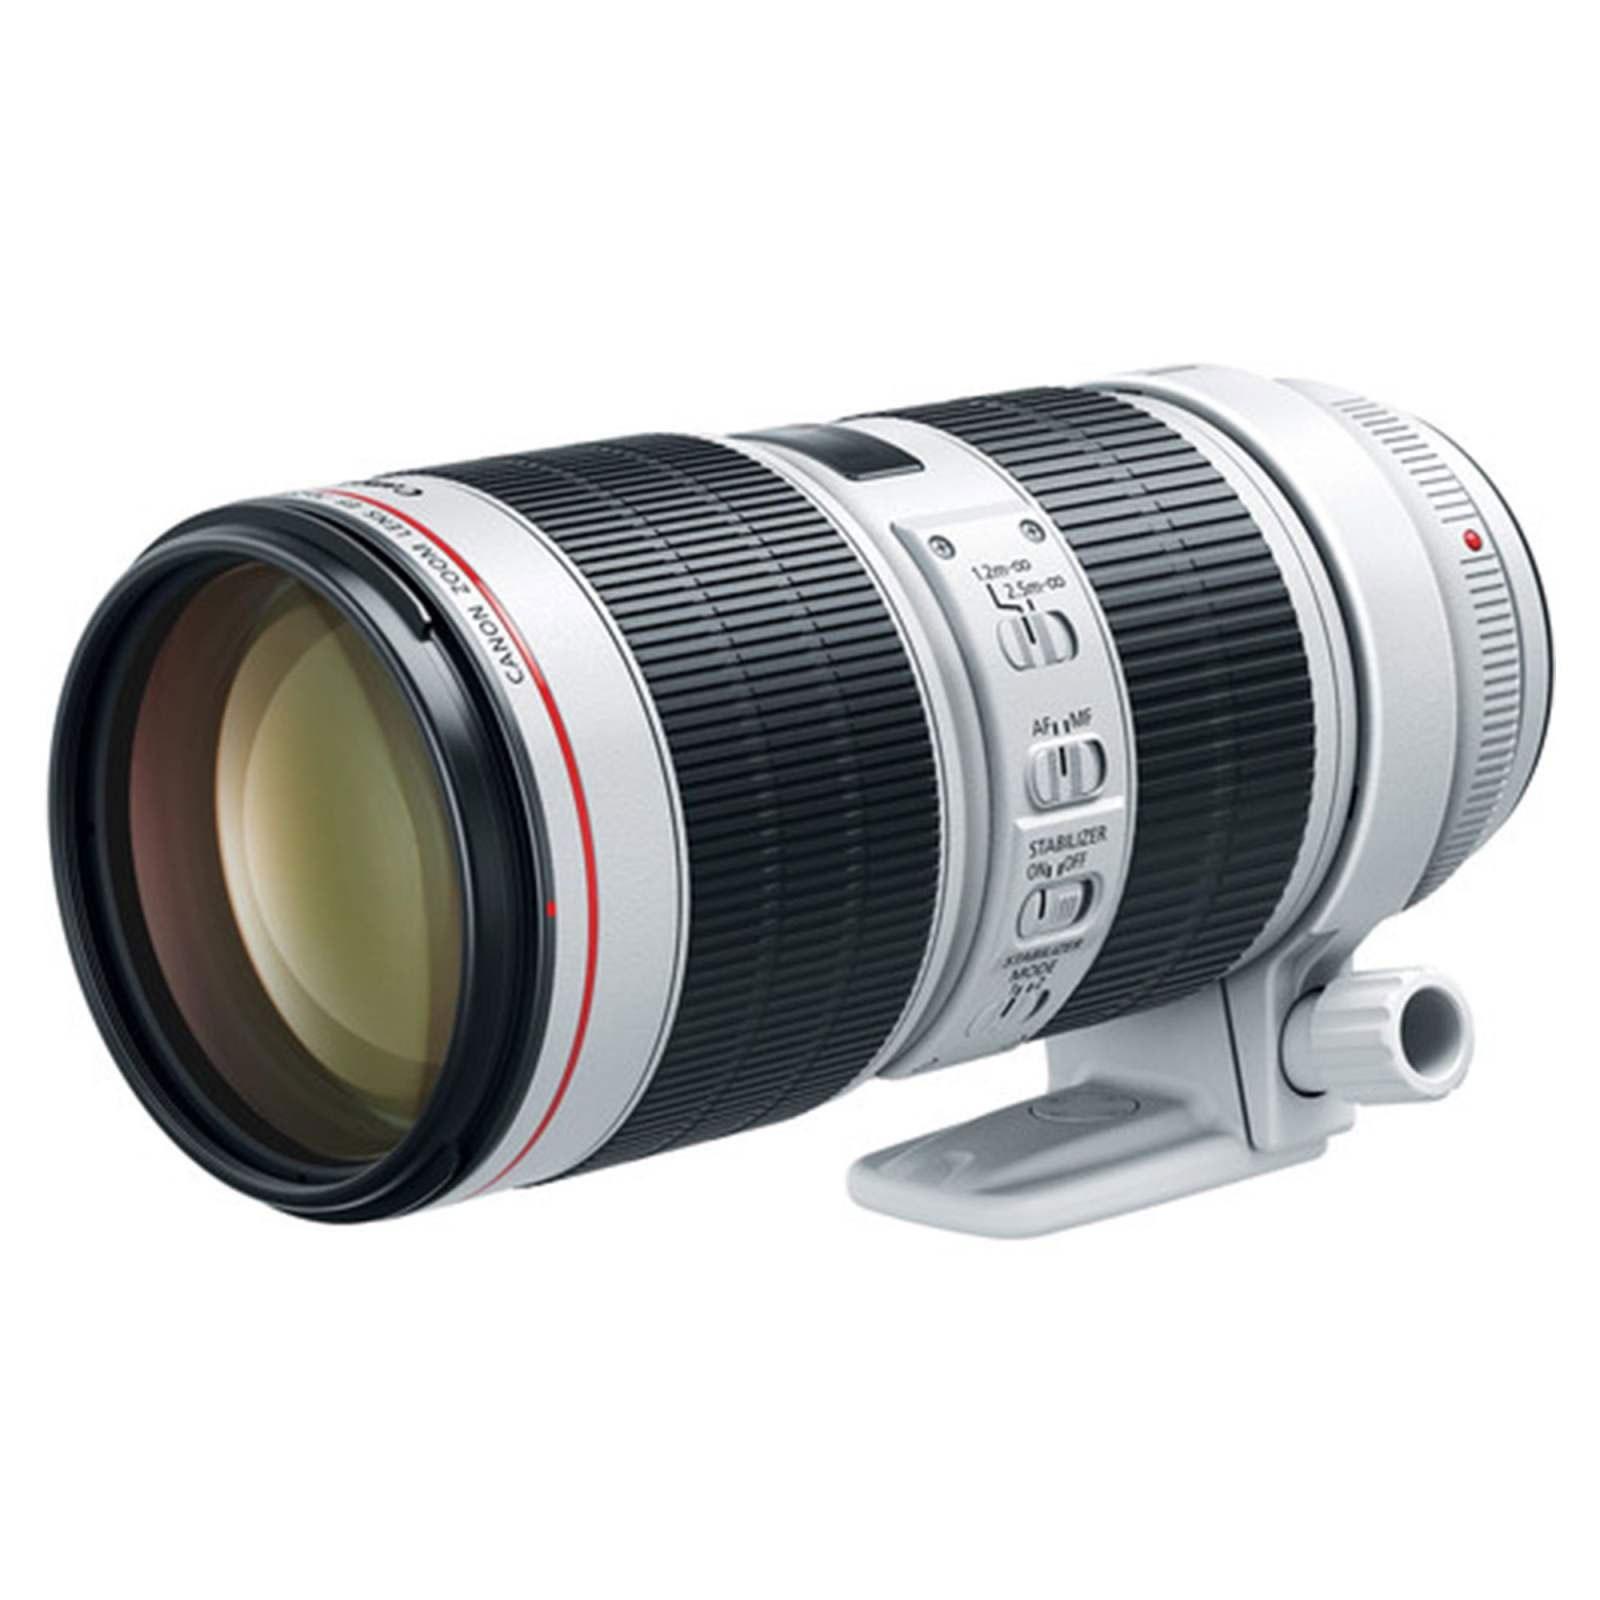 تصویر Lens Canon EF 70-200mm f/2.8L IS III USM لنز دوربین کانن EF 70-200mm f/2.8L IS III USM